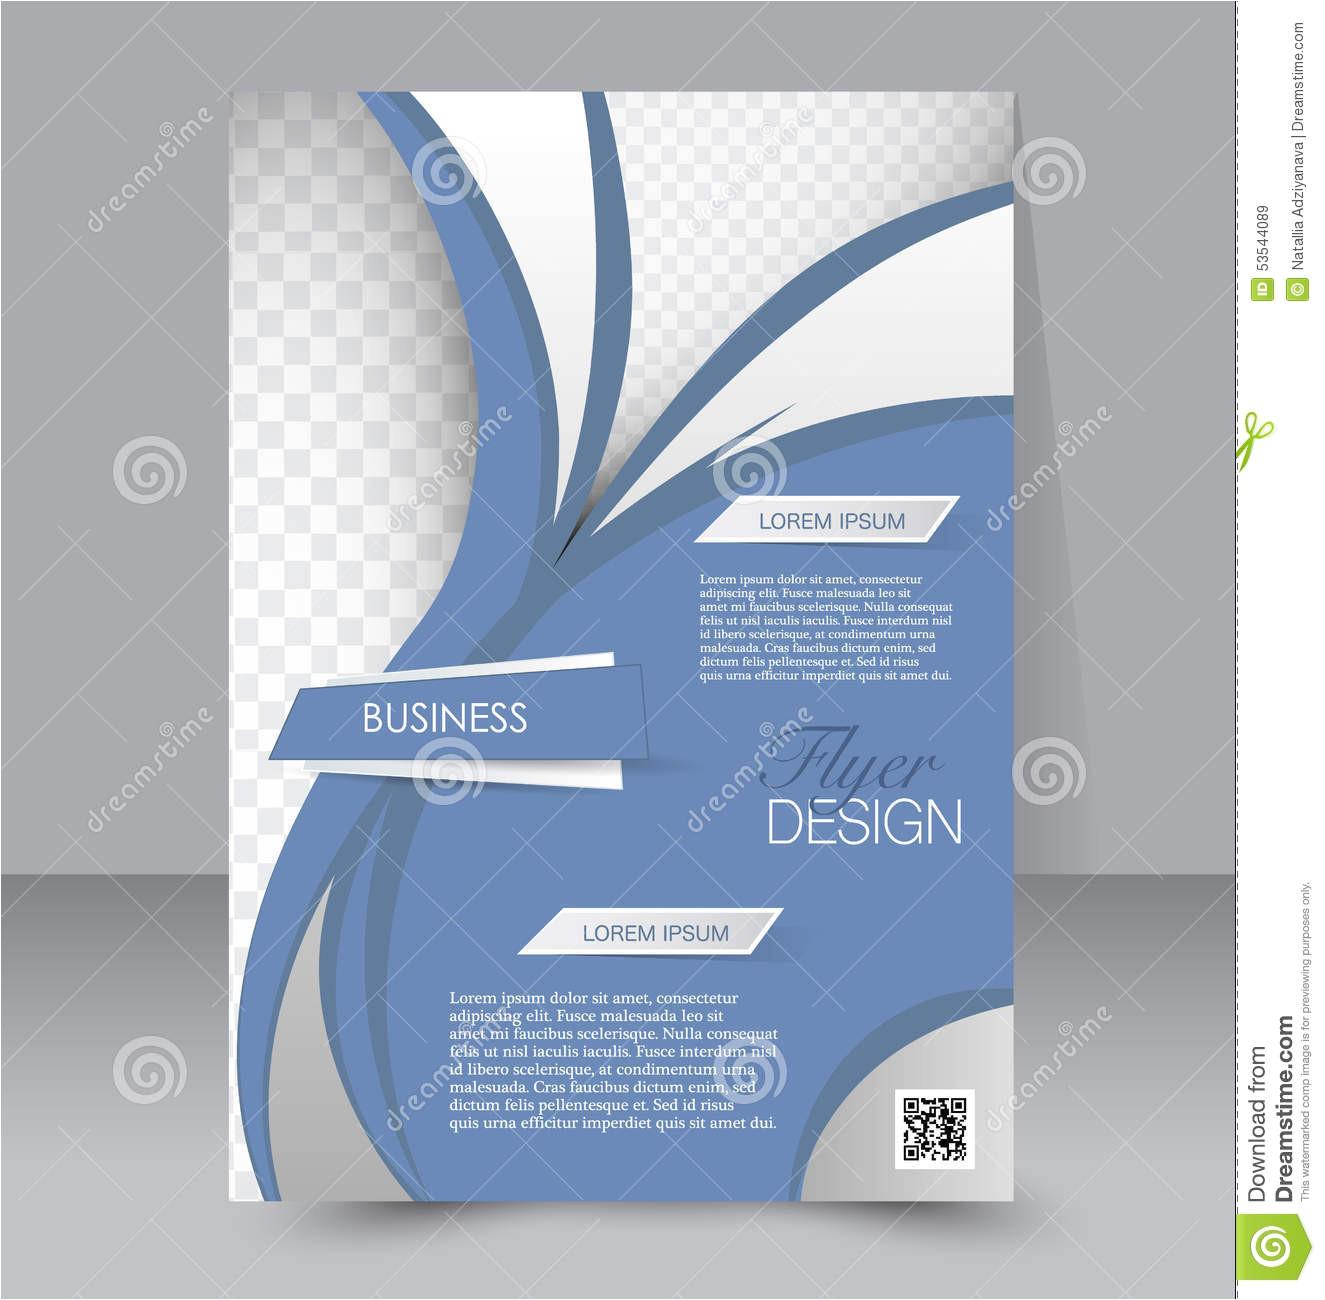 stock illustration flyer template business brochure editable poster design education presentation website magazine cover blue color image53544089